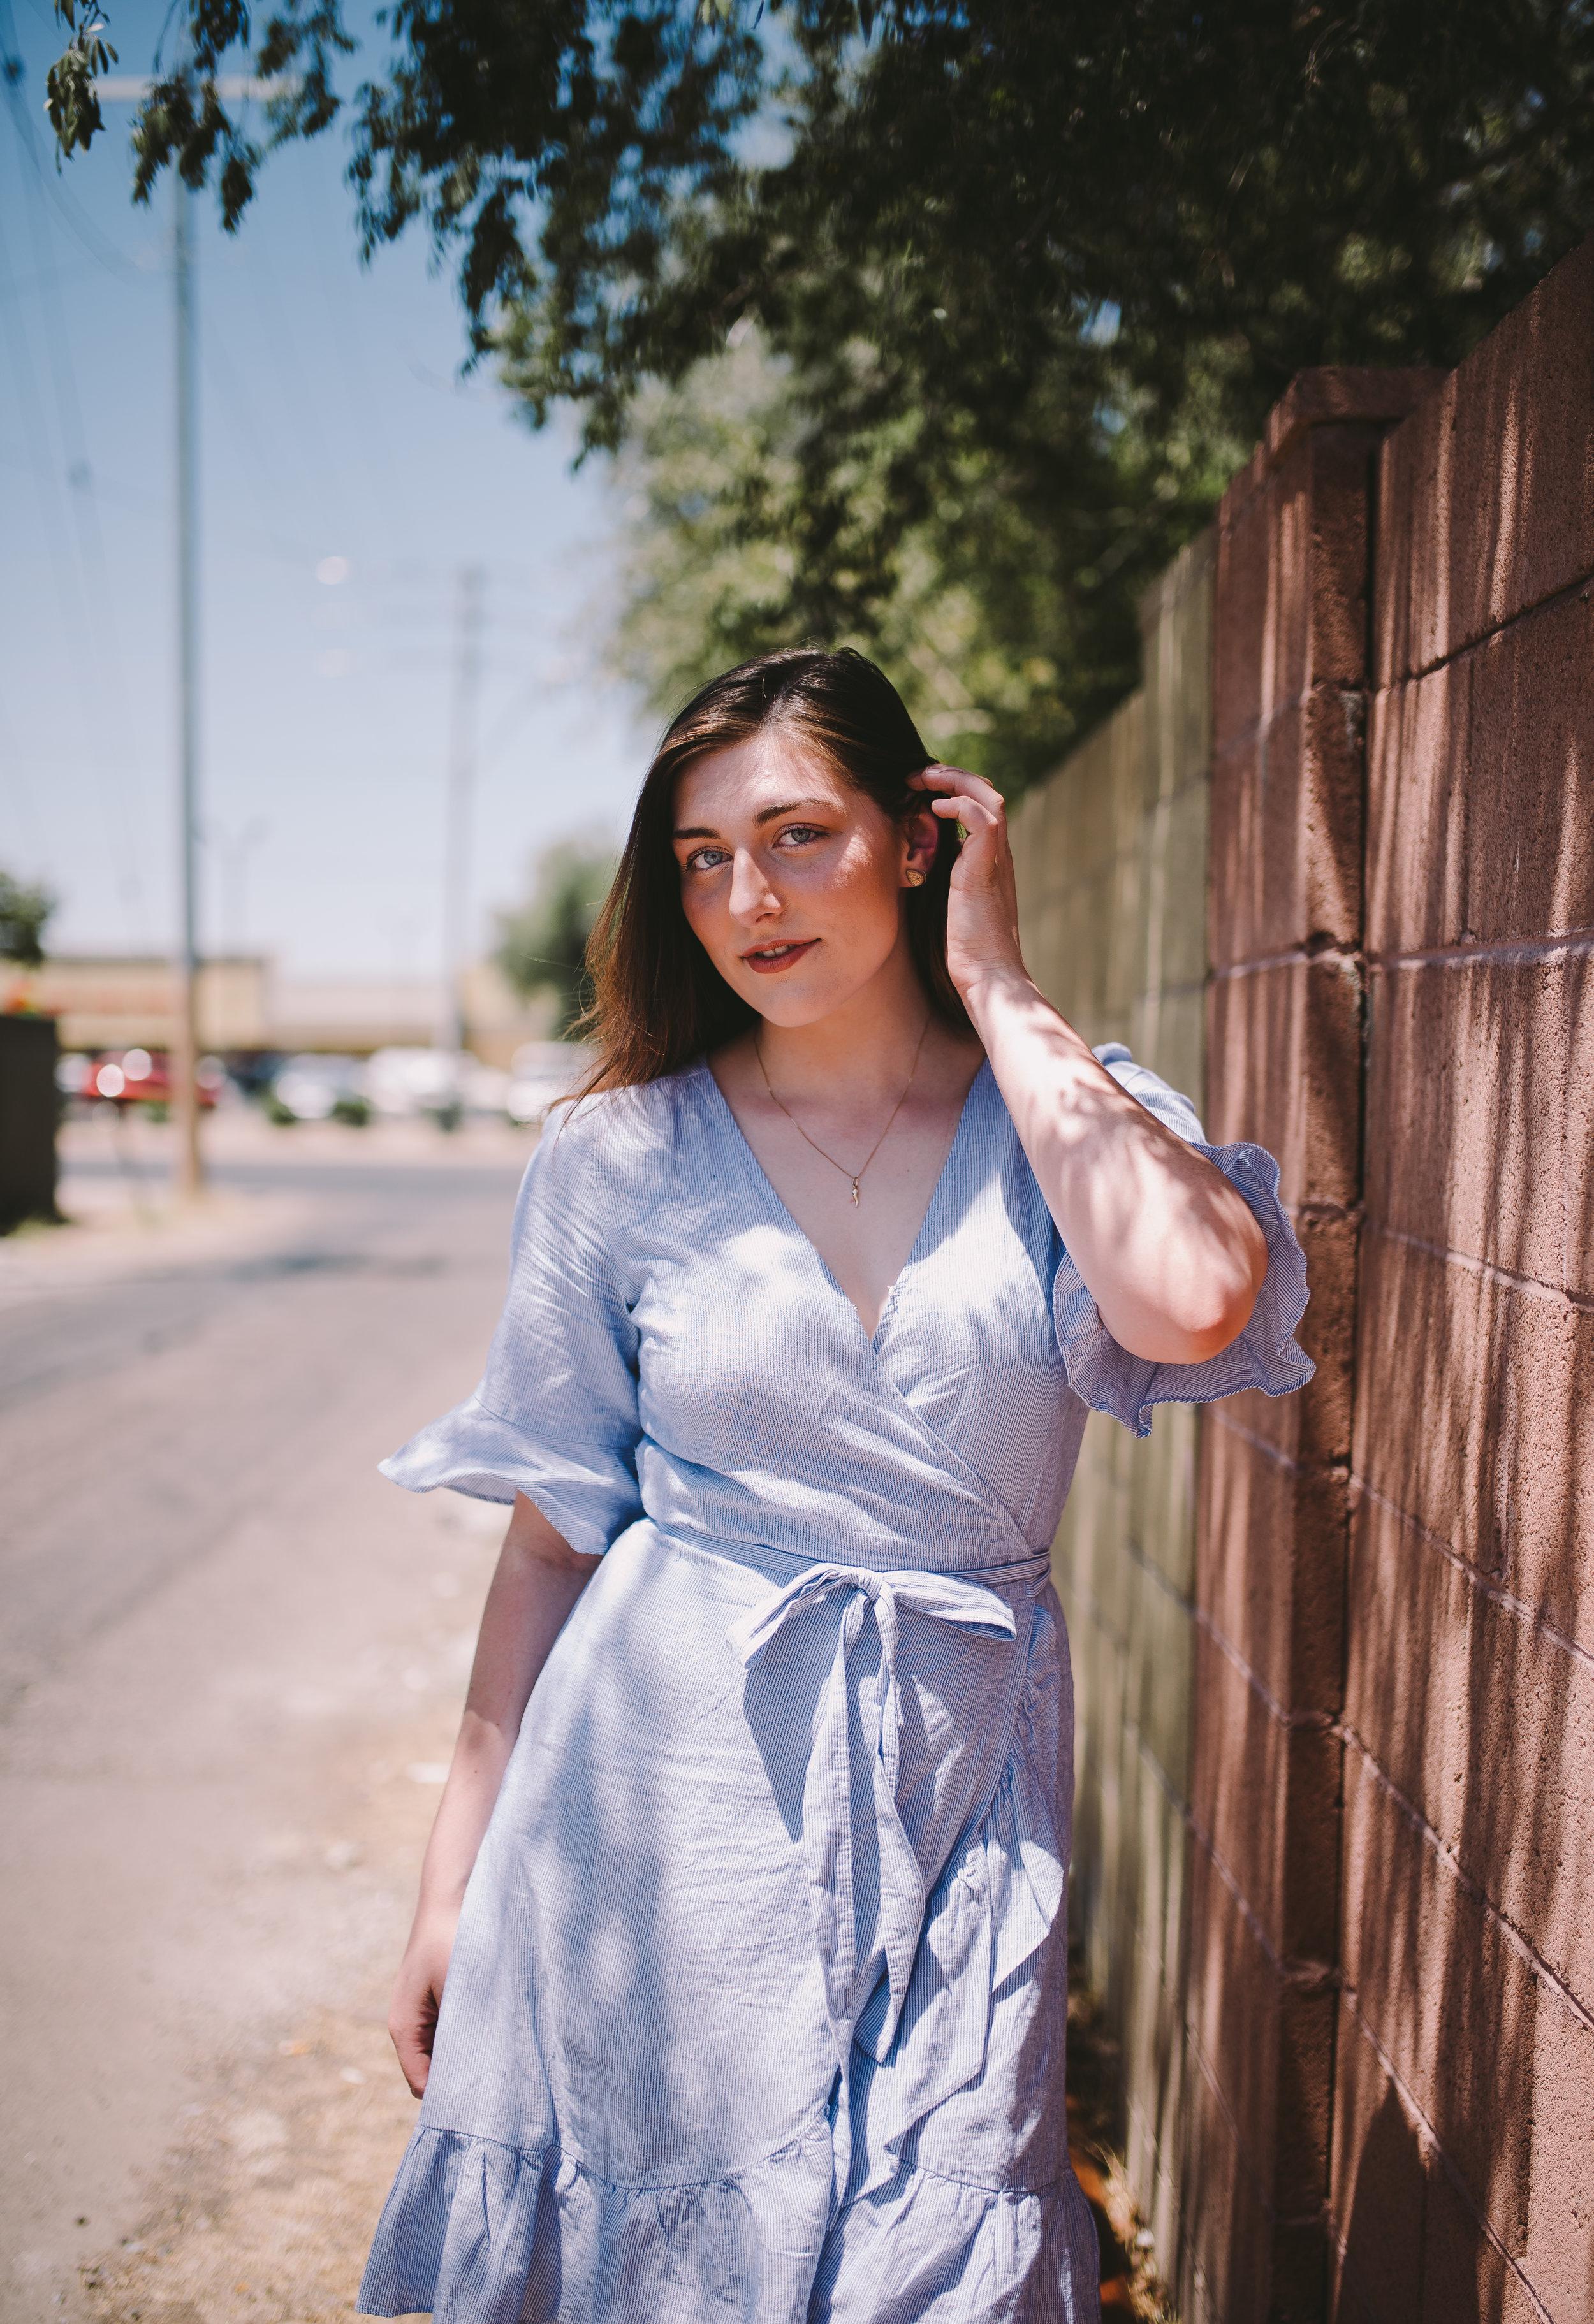 EmilyKidd_PhoenixArizona_June2018_Senior Photography In Phoenix Arizona_ArizonaSeniorPhotographer_SamanthaRosePhotography_BLOG_014.JPG